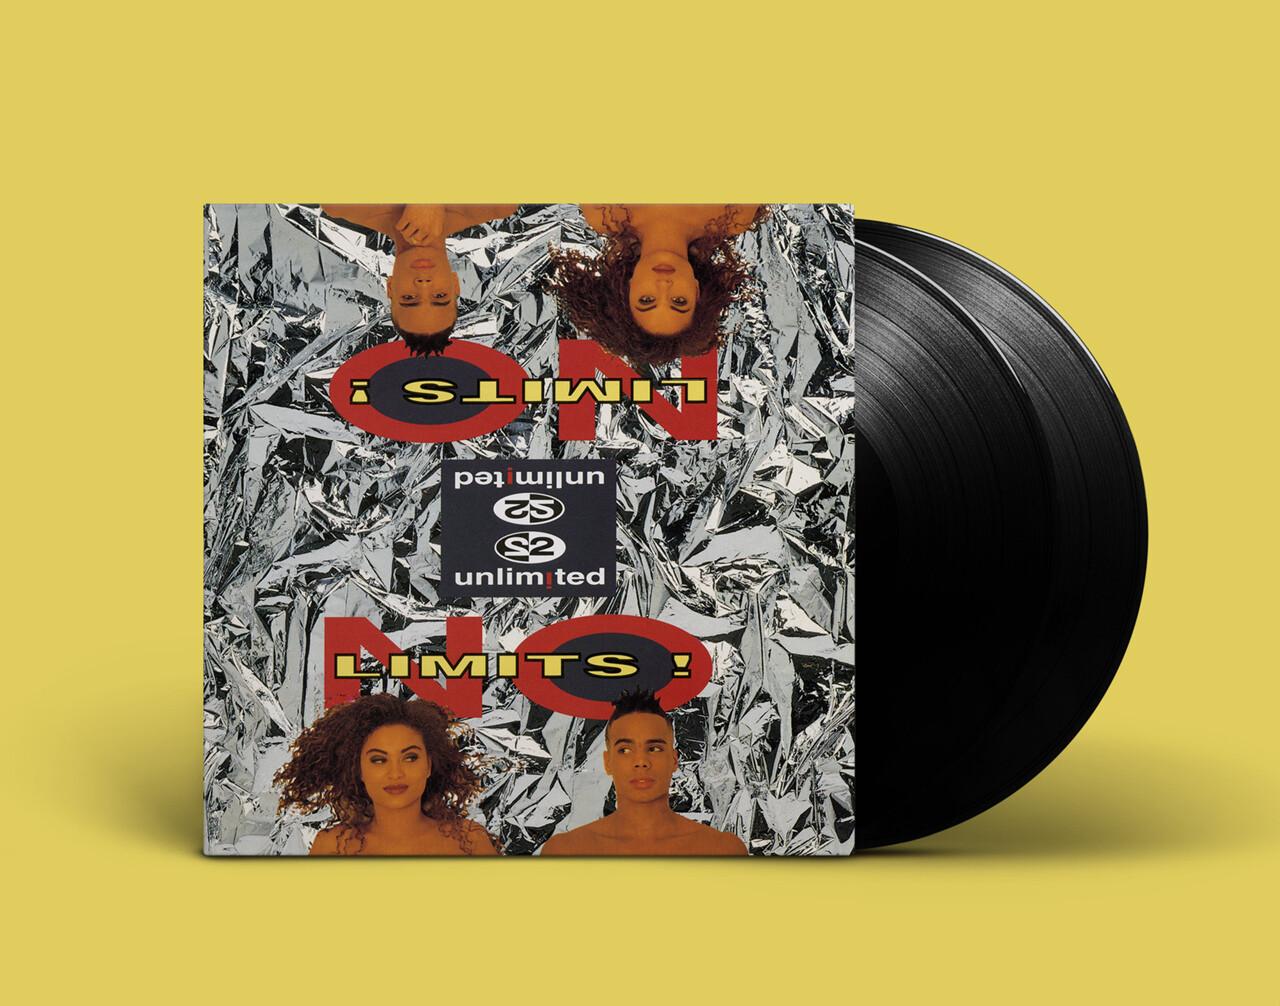 [PREORDER] LP: 2UNLIMITED  — «No Limits!» (1993/2021) [2LP Black Vinyl]